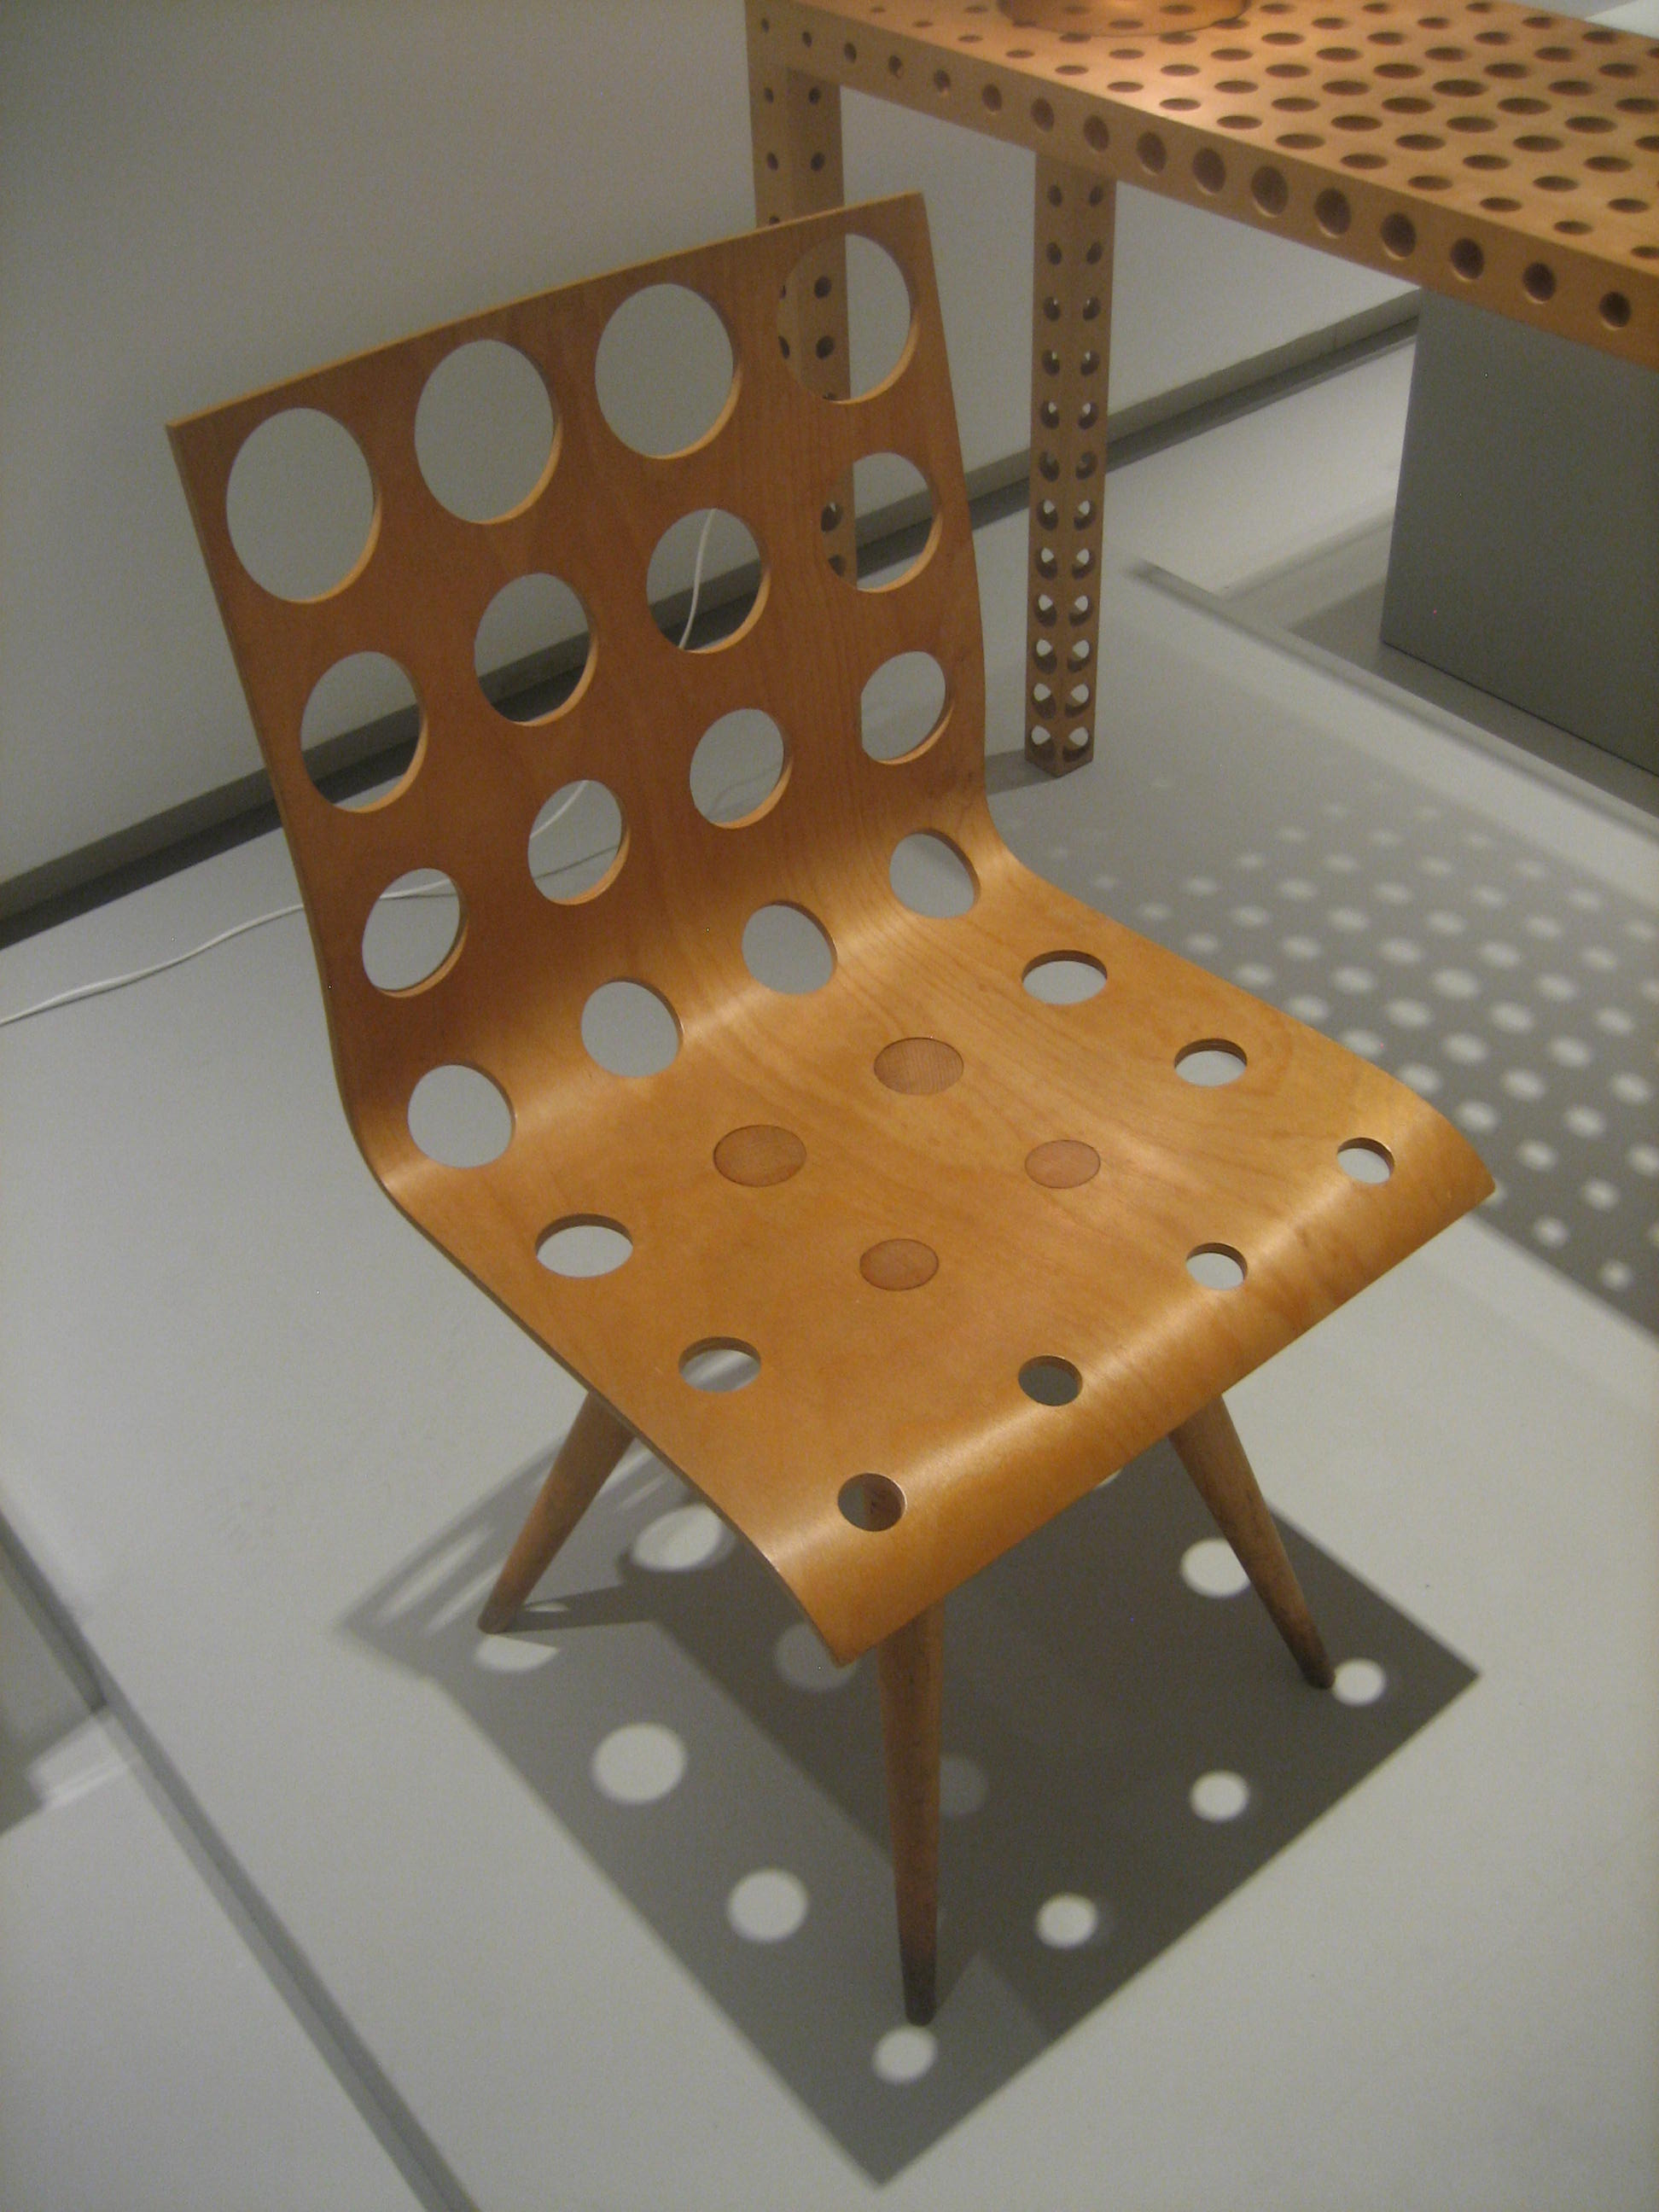 Gijs Bakker, Chair with Holes no. 2, 1991. Foto Esther Doornbusch, 2 december 2018, CC BY 4.0